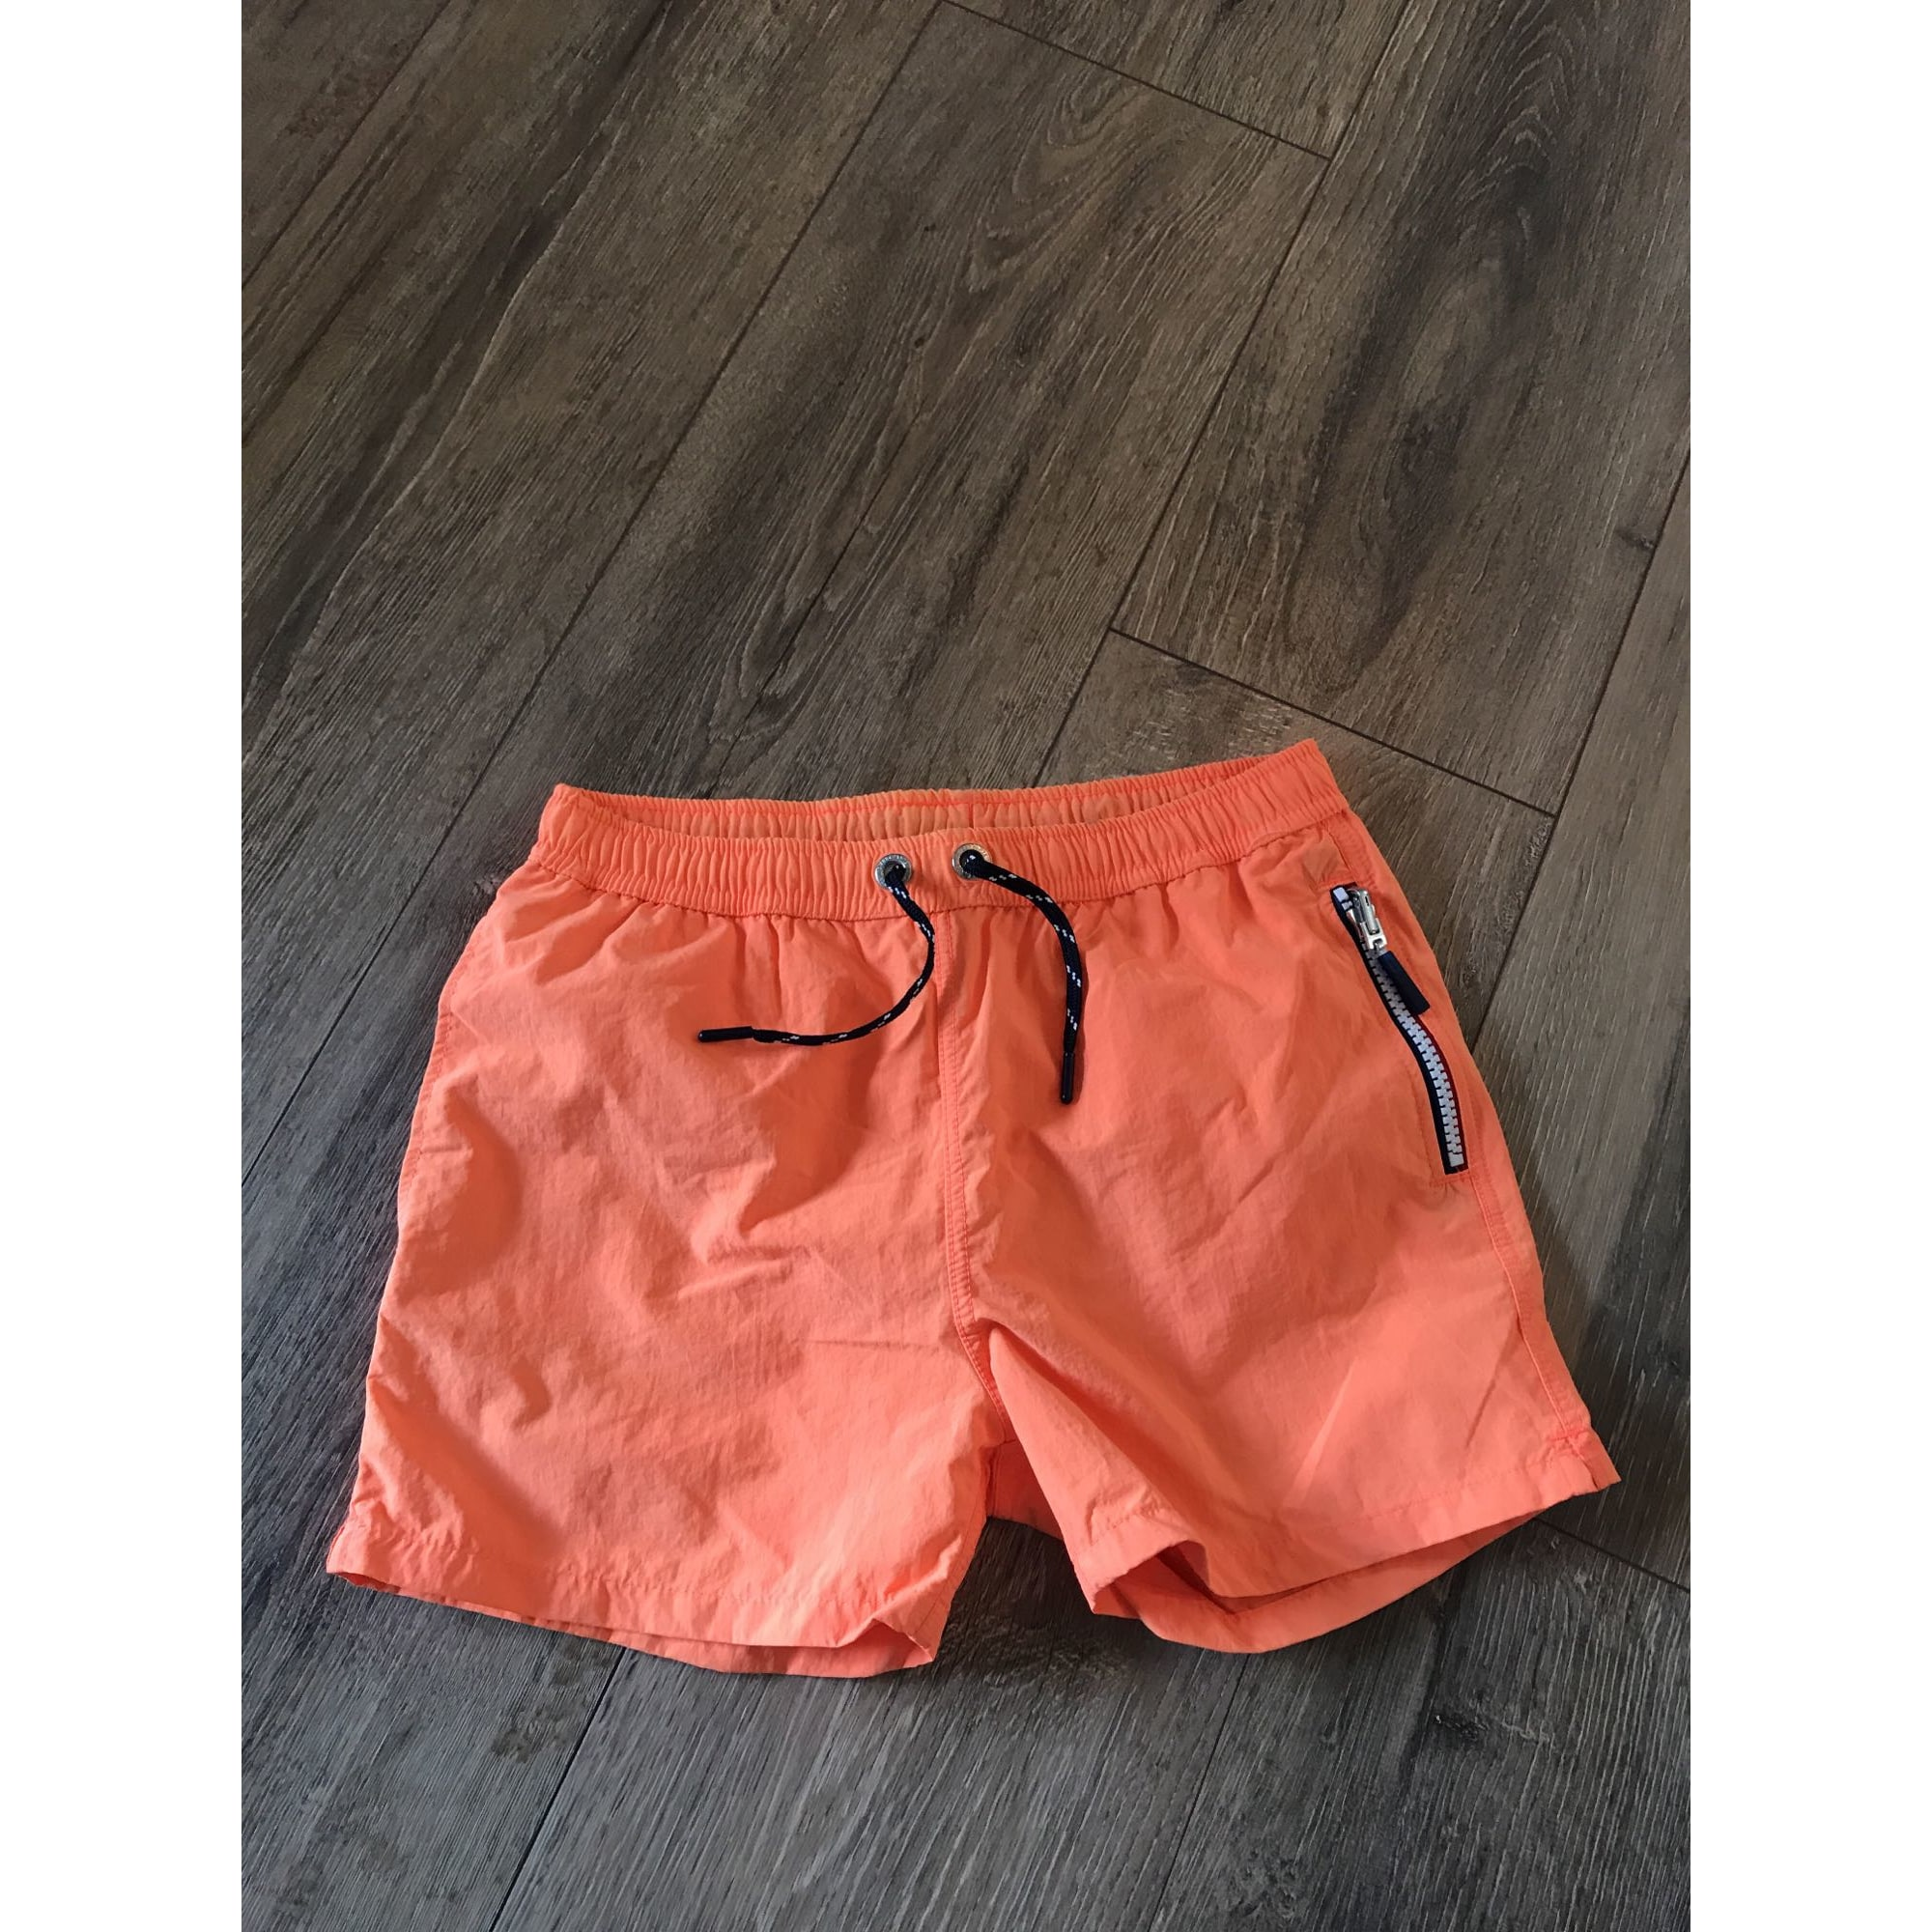 Short de bain SWEET PANTS Orange fluo